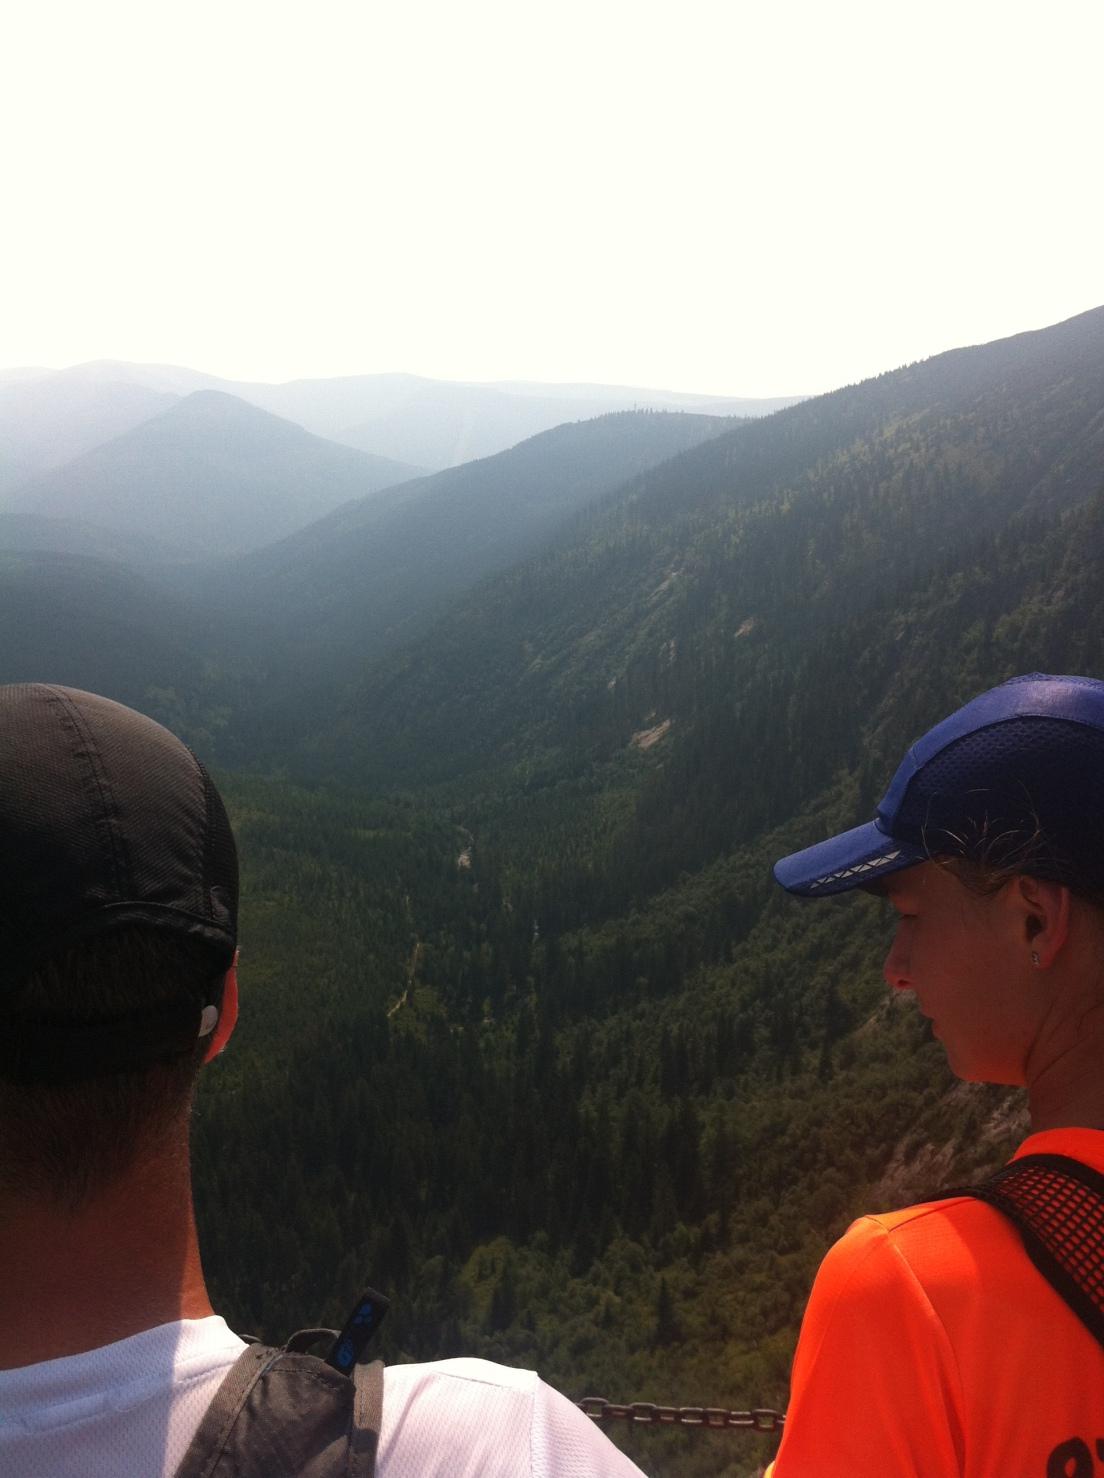 Stunning views in the Czech Republic mountains